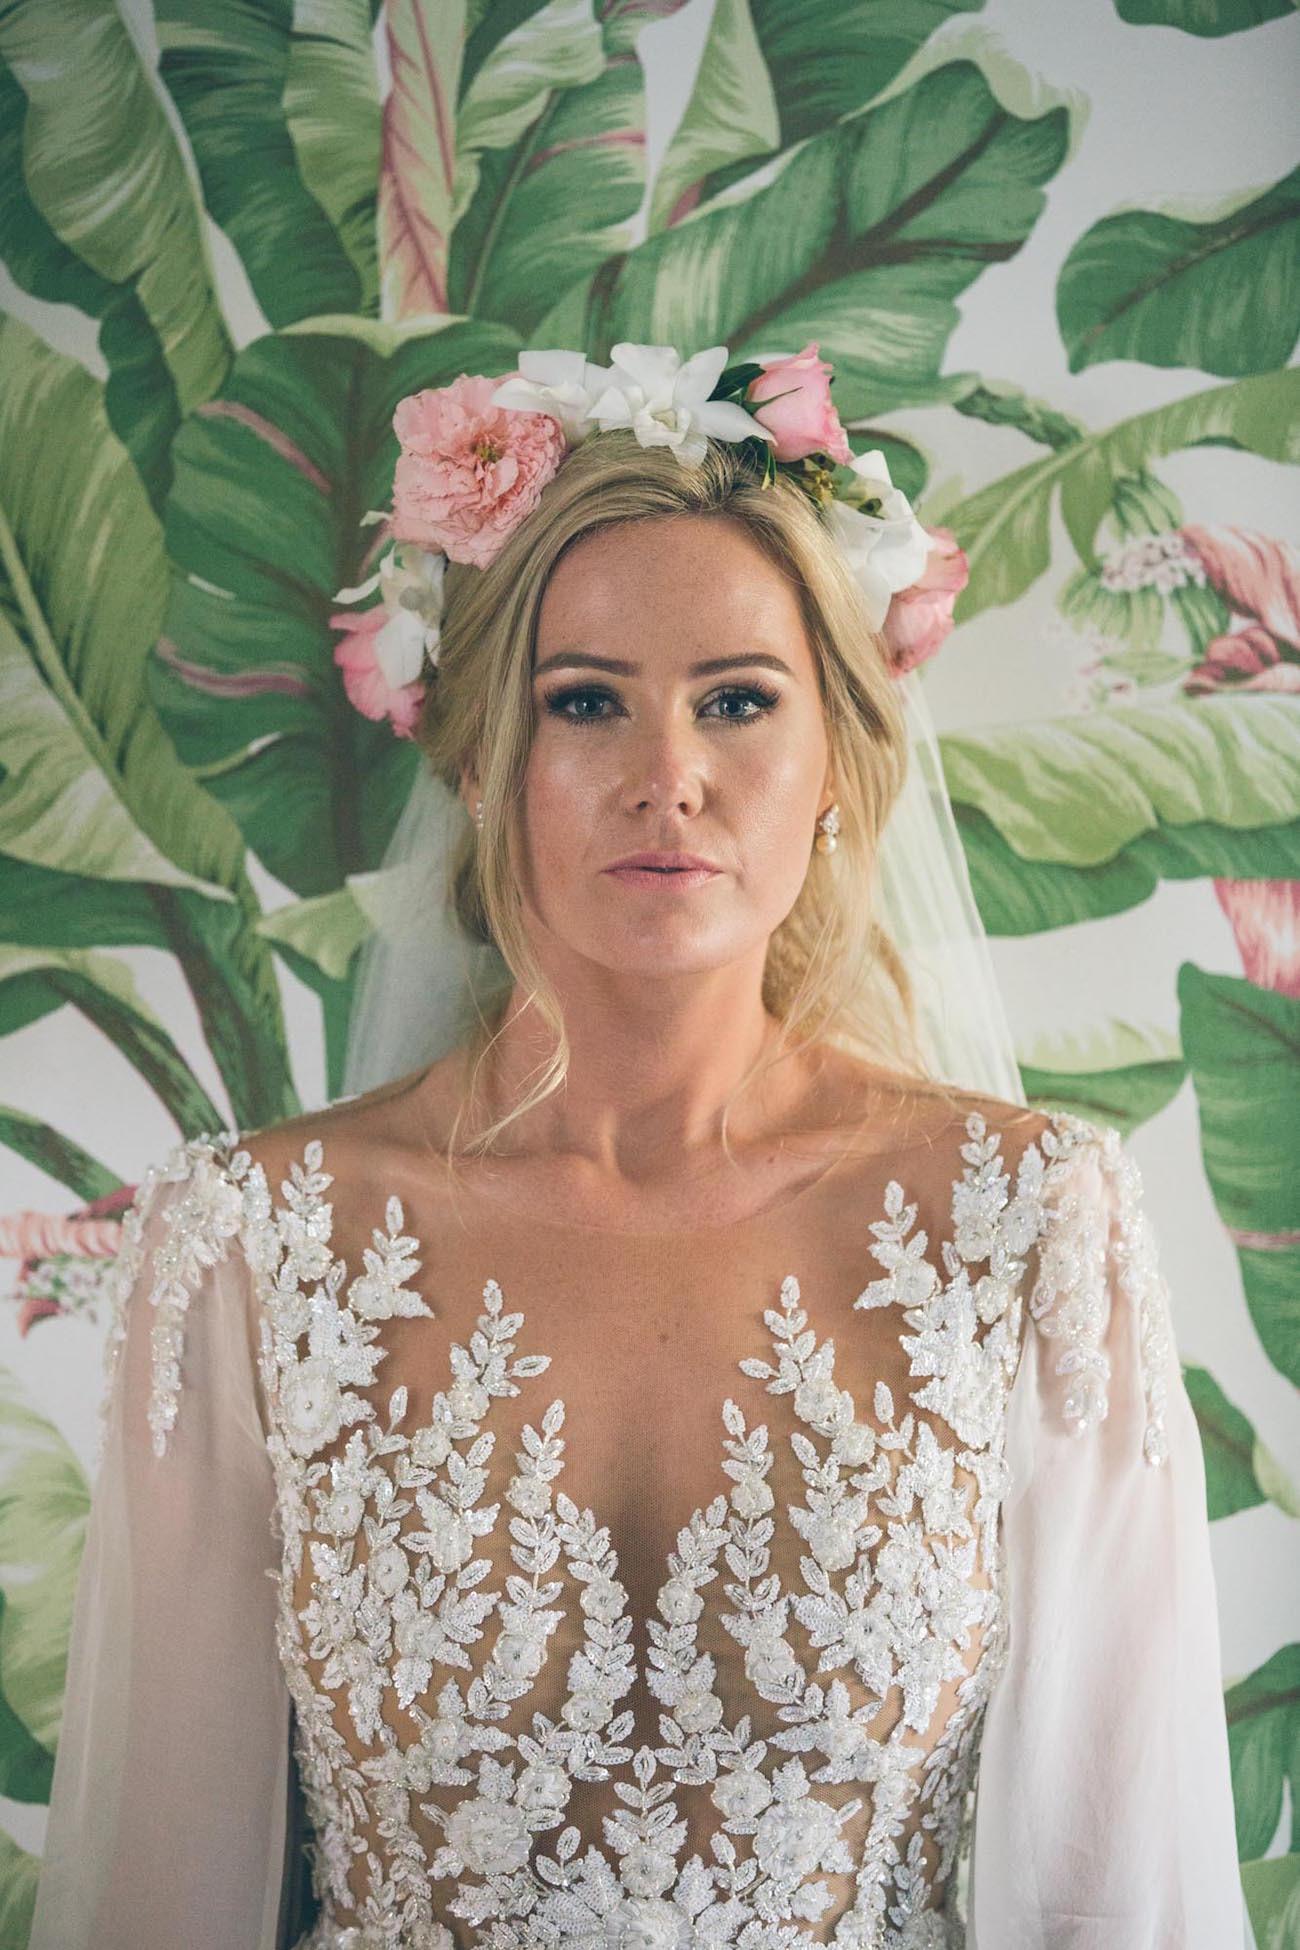 Bride in pink floral crown | Credit: Shanna Jones